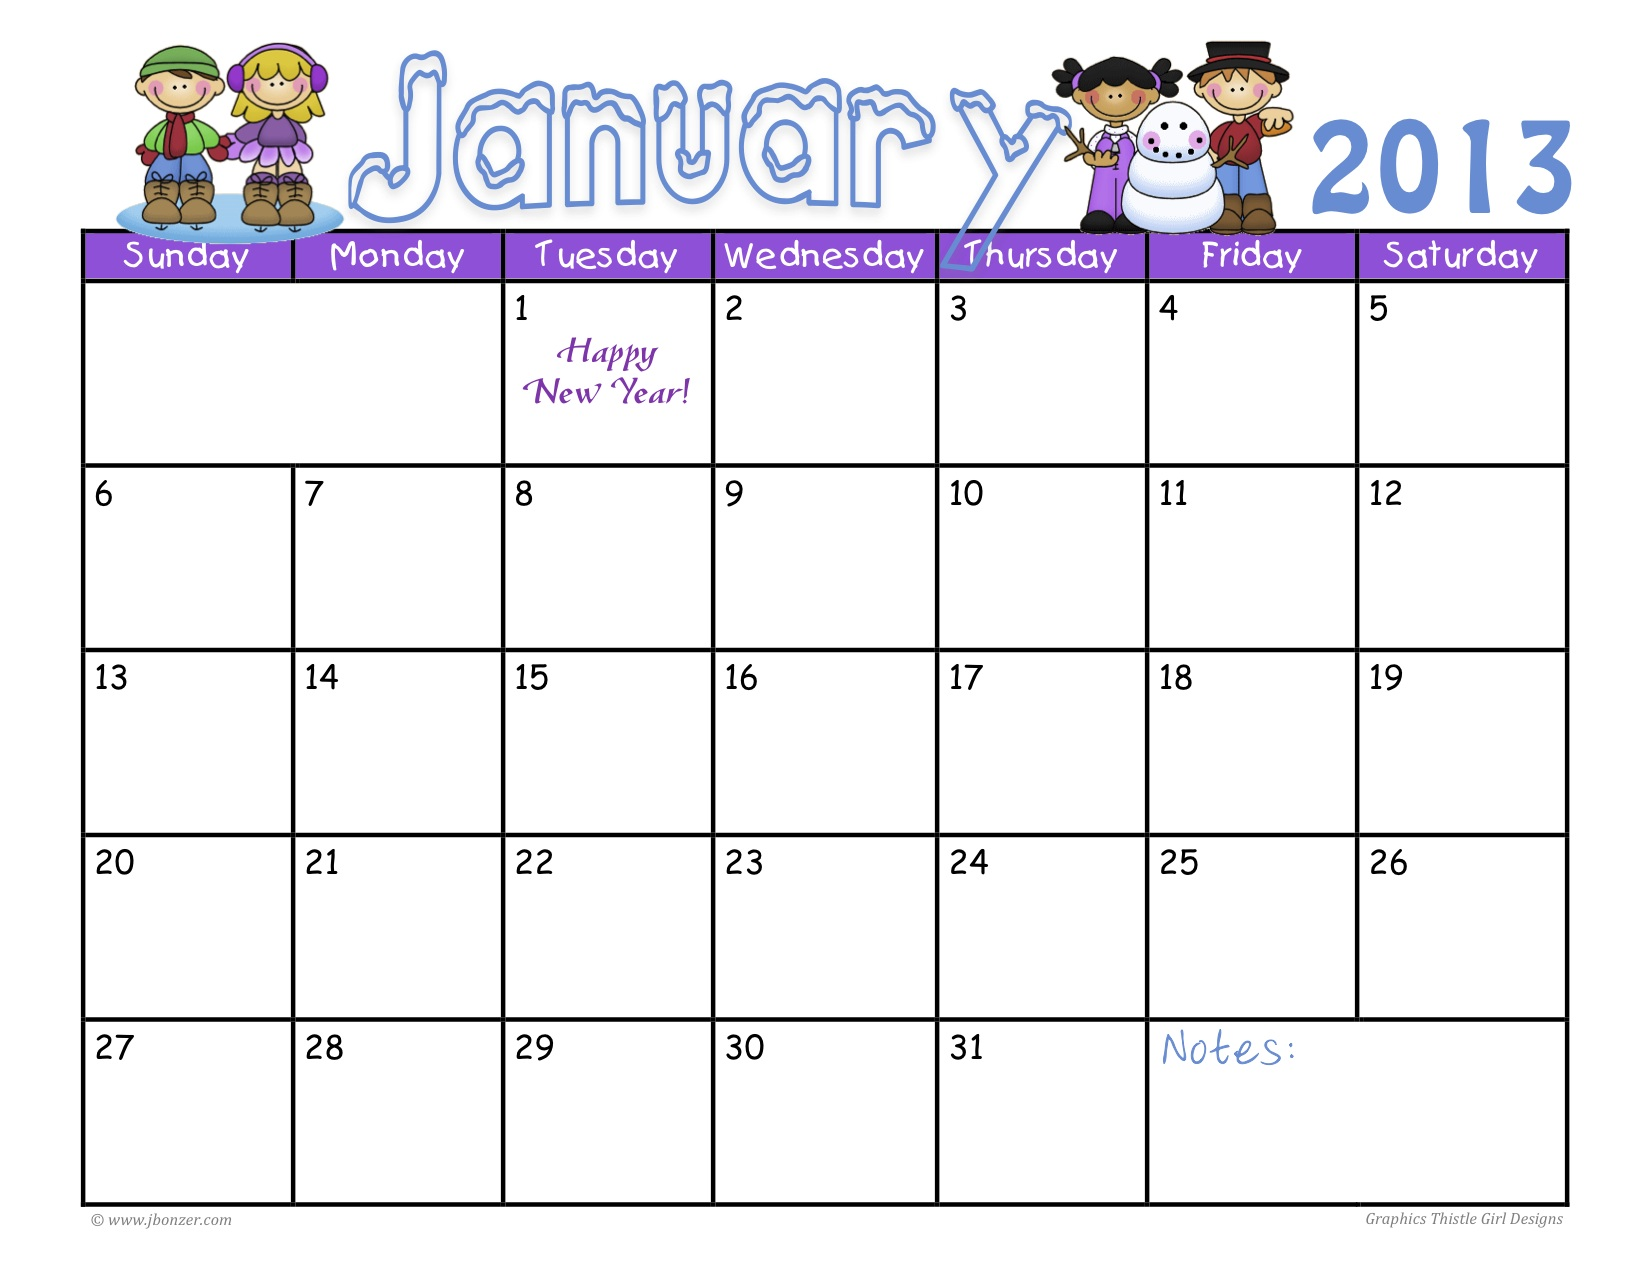 January Calendar Kids : January events at ekmha